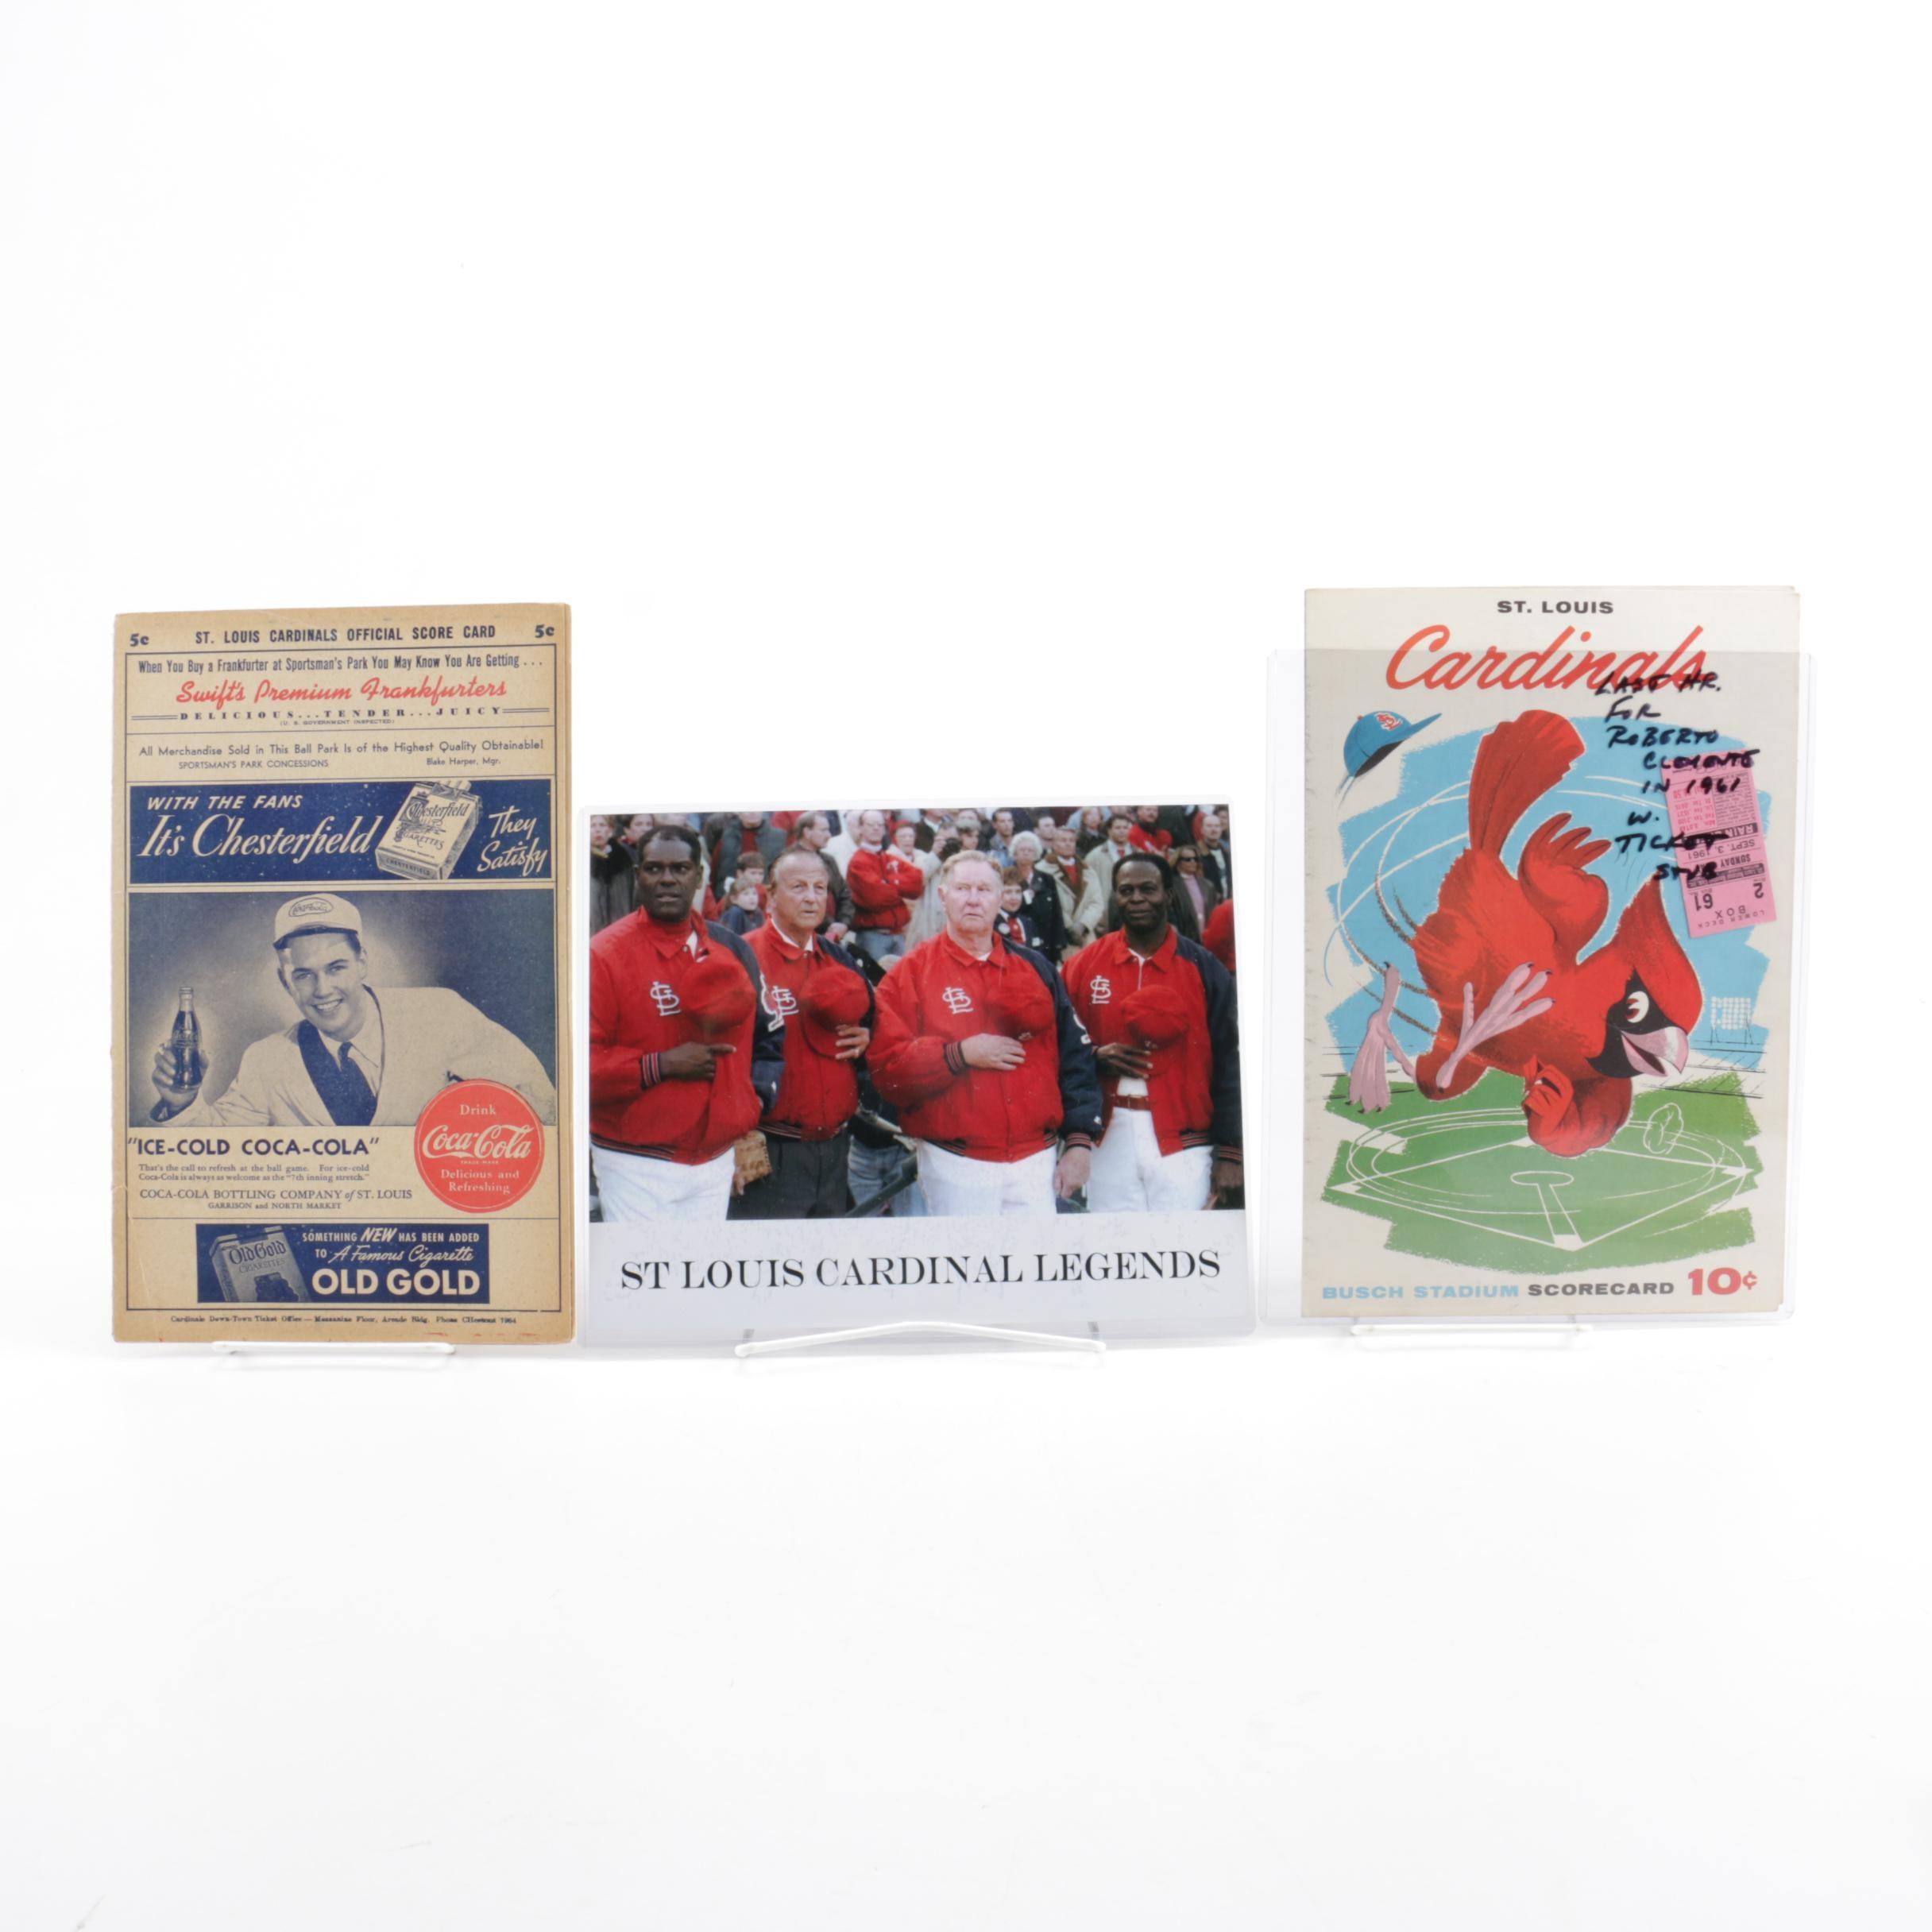 St. Louis Cardinals Baseball Souvenirs